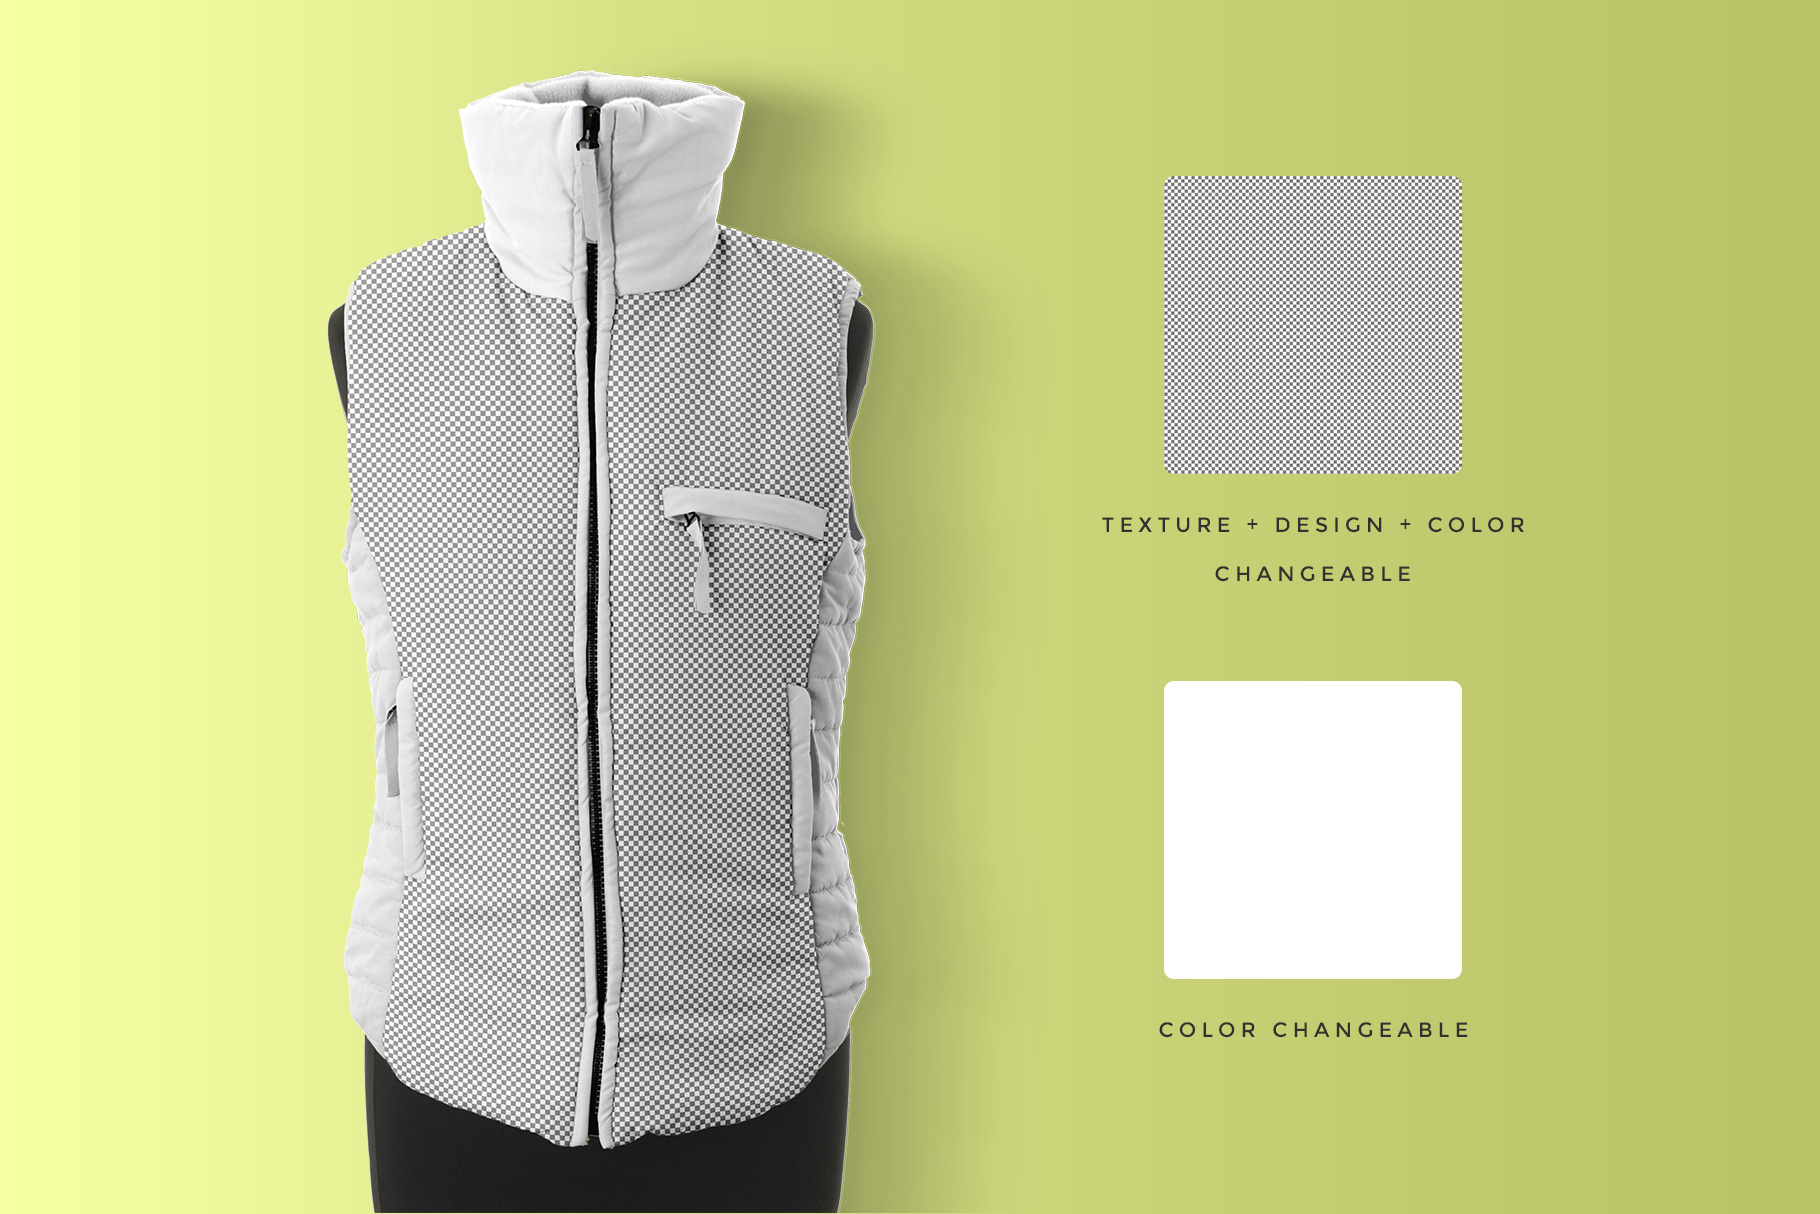 editability of the women's sleeveless winter jacket mockup